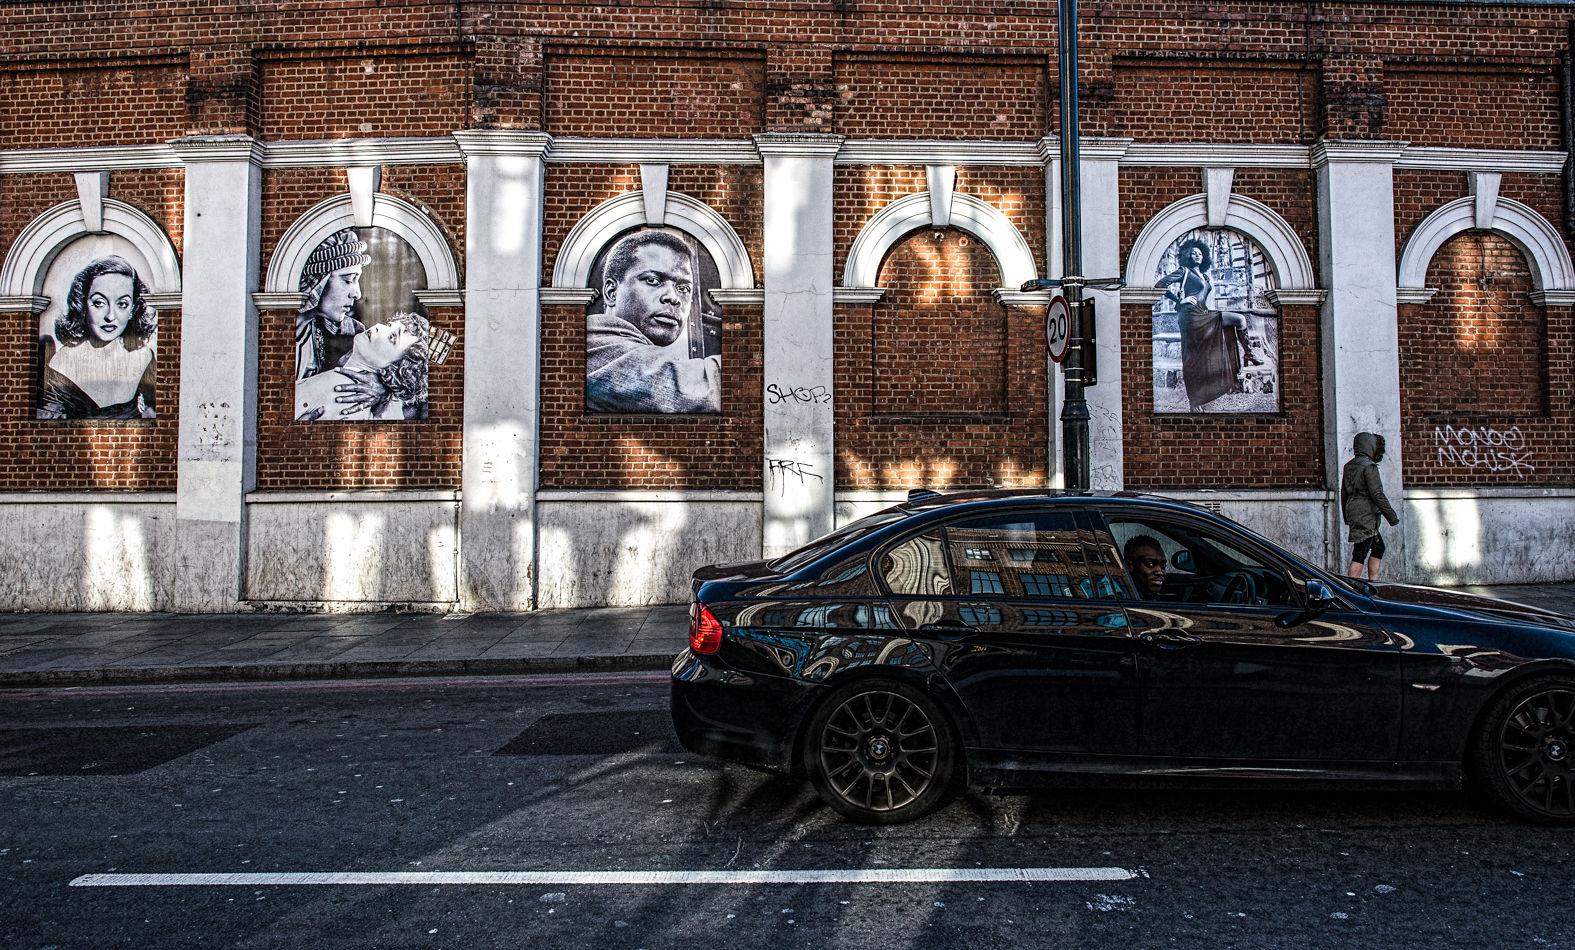 The Ritzy Cinema, Brixton